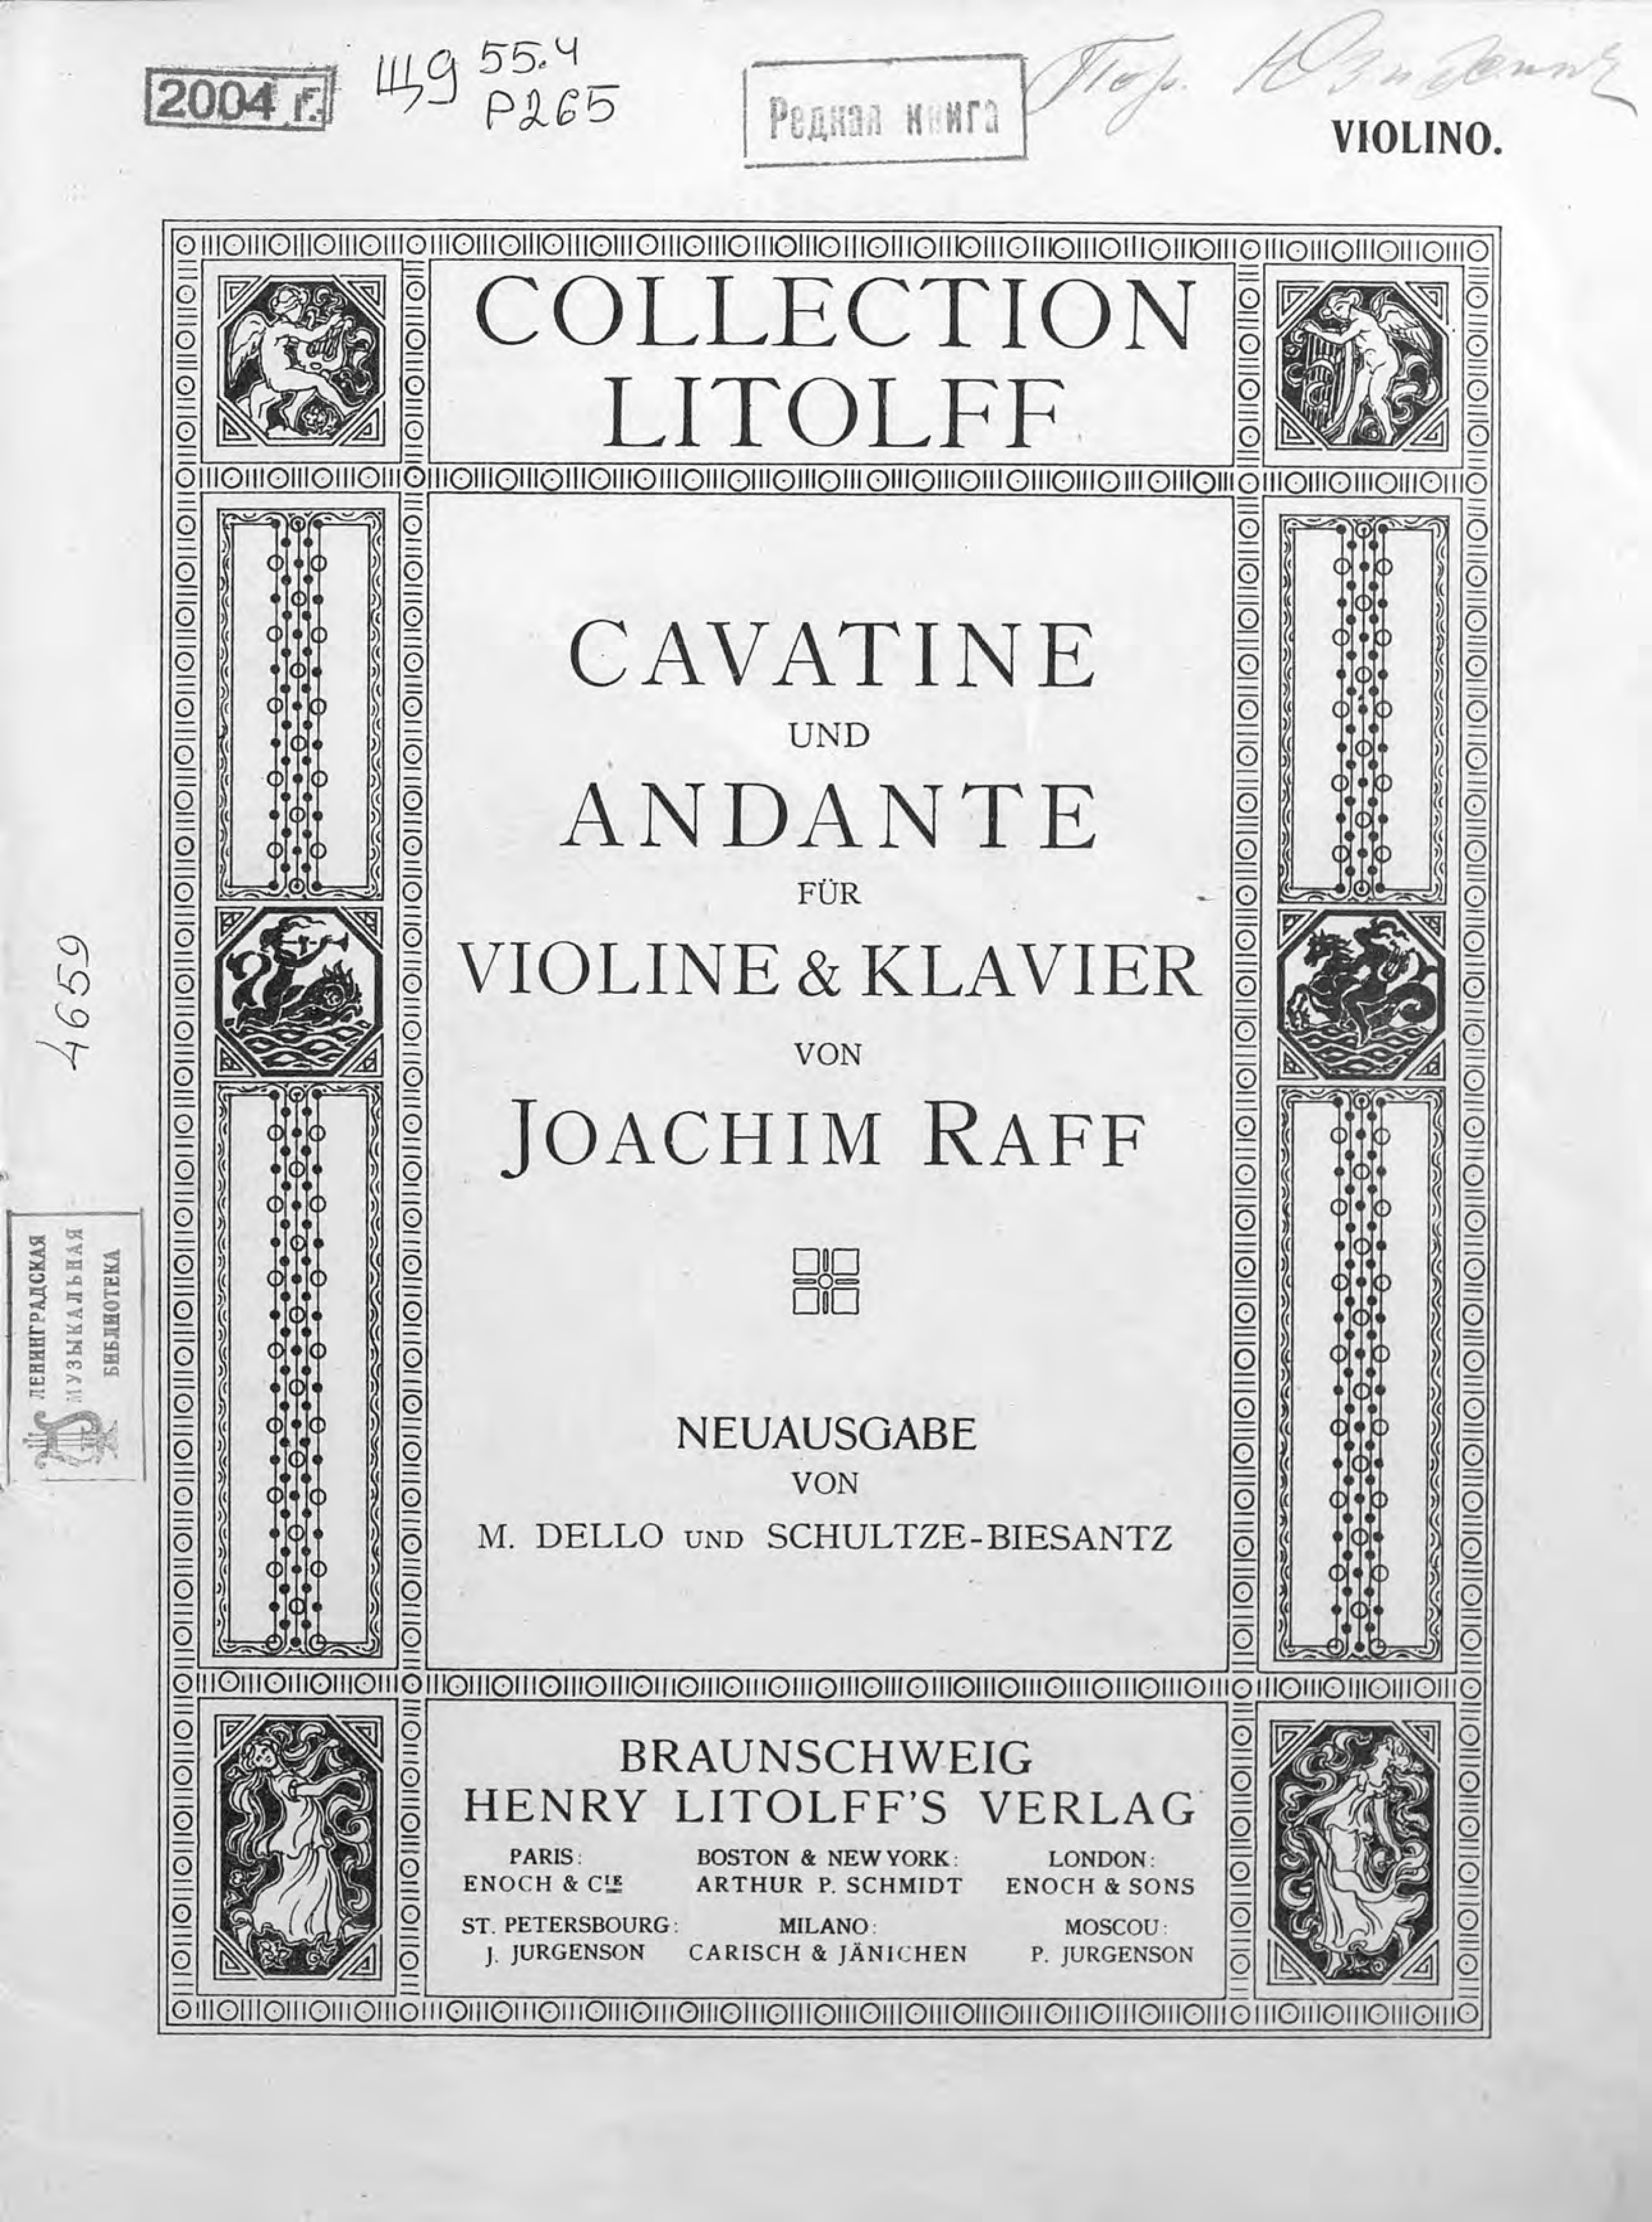 Йозеф Иоахим Рафф Cavatine, op. 85, № 3 und Andante fur violine & Klavier von J. Raff